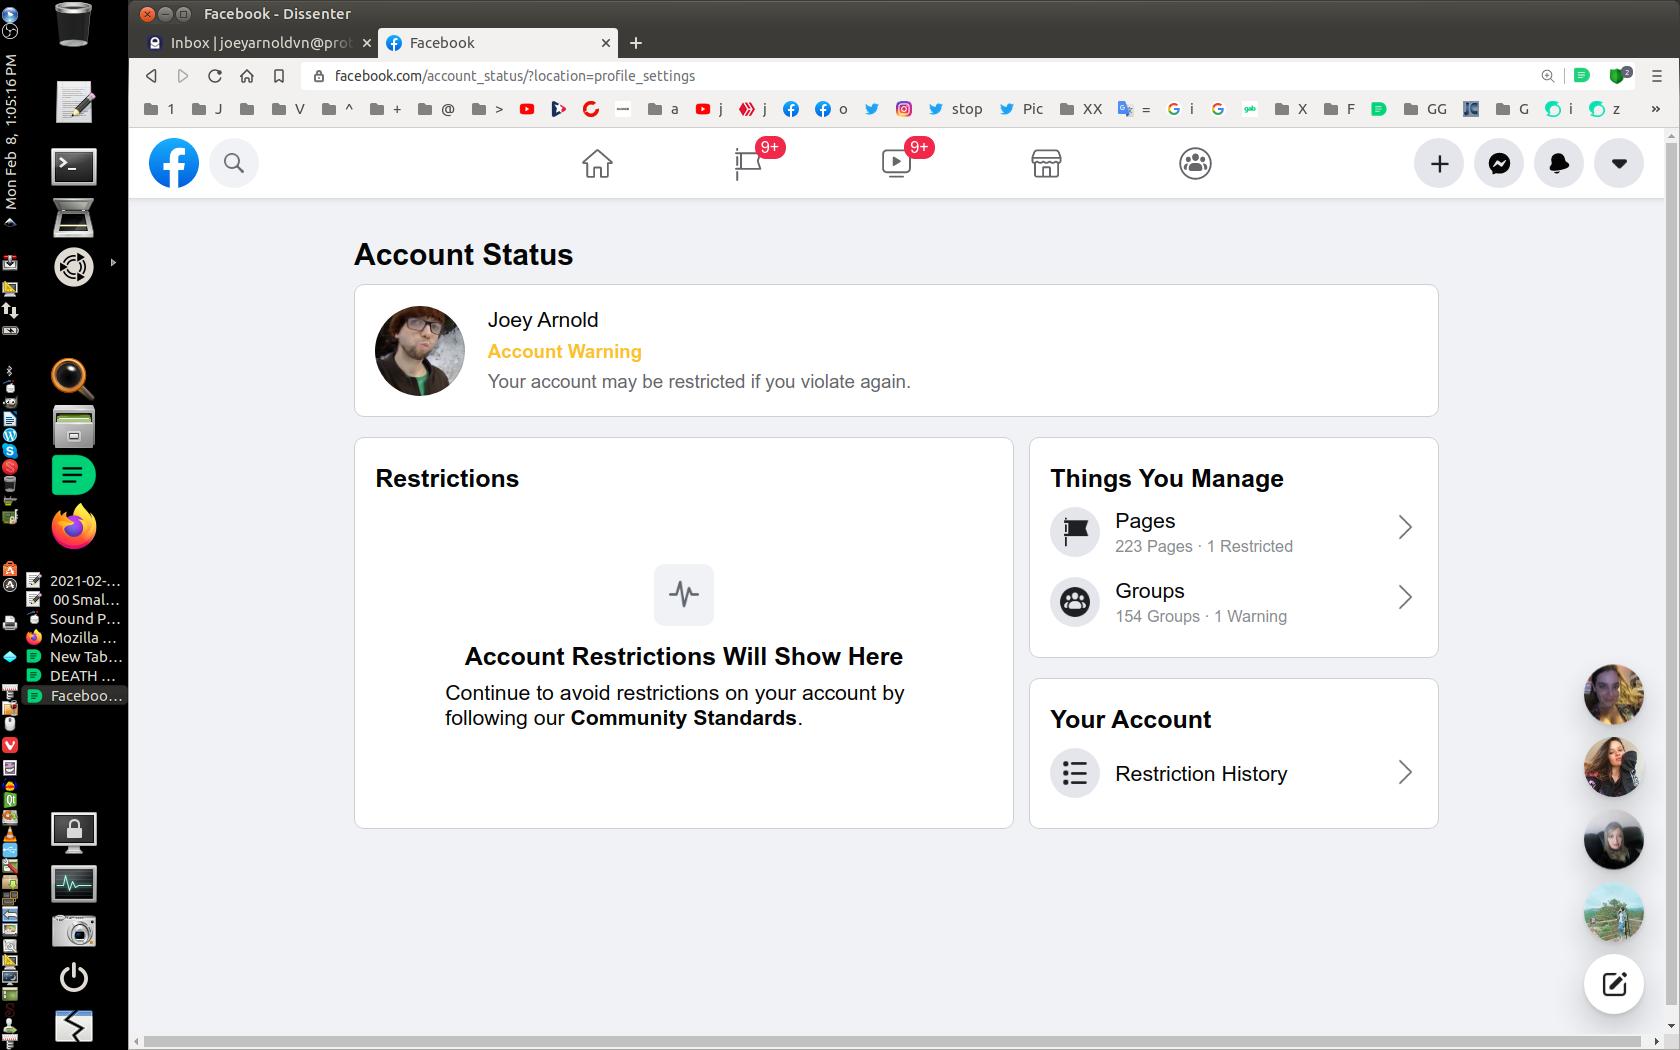 Screenshot at 2021-02-08 13:05:16 Facebook Restricted.png